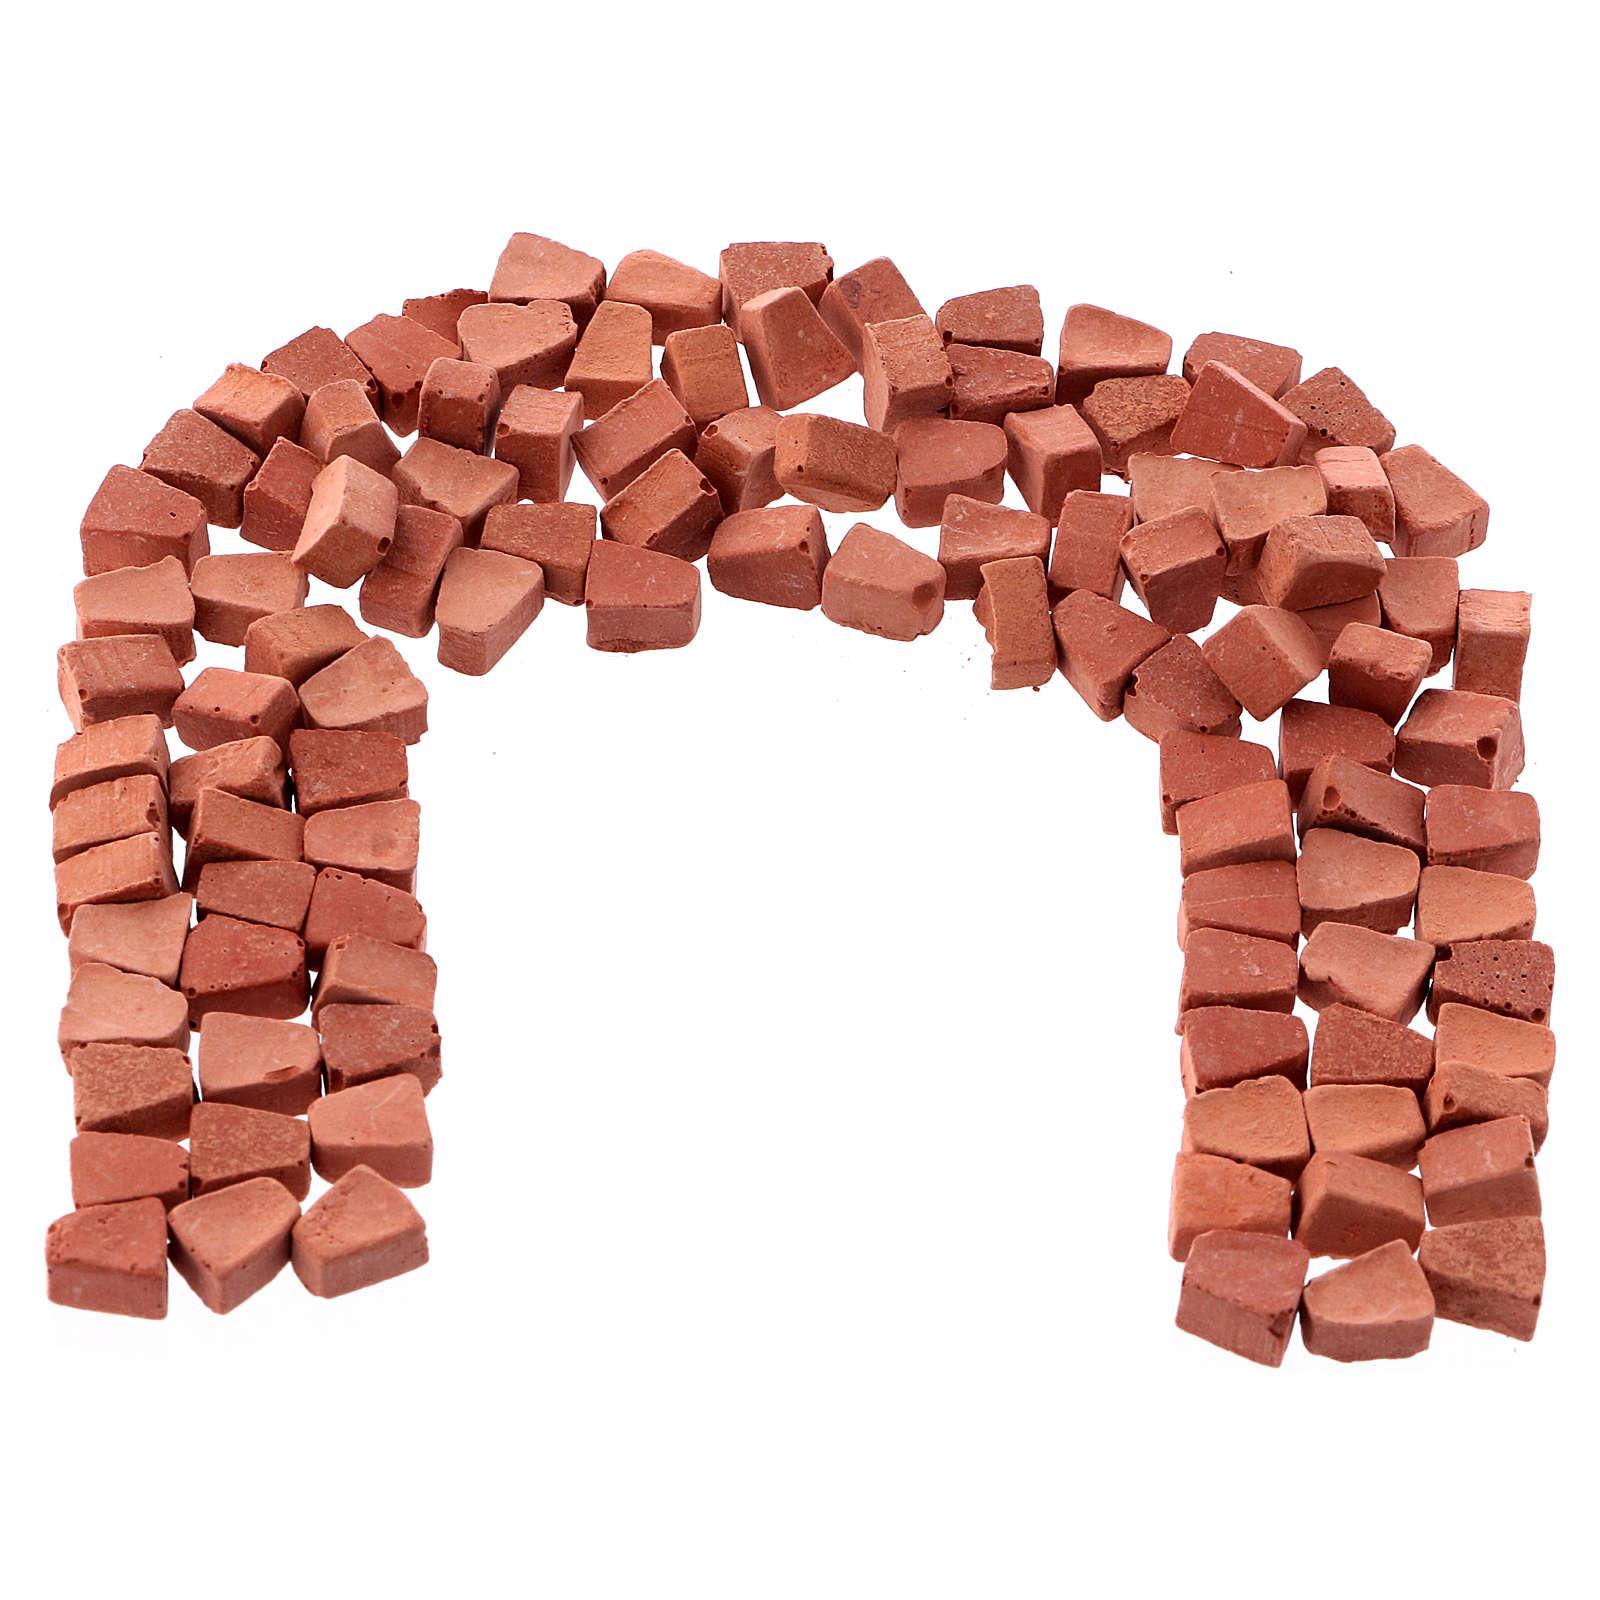 Ladrillos de arco de resina color terracota 5x5 mm set 100 piezas 4